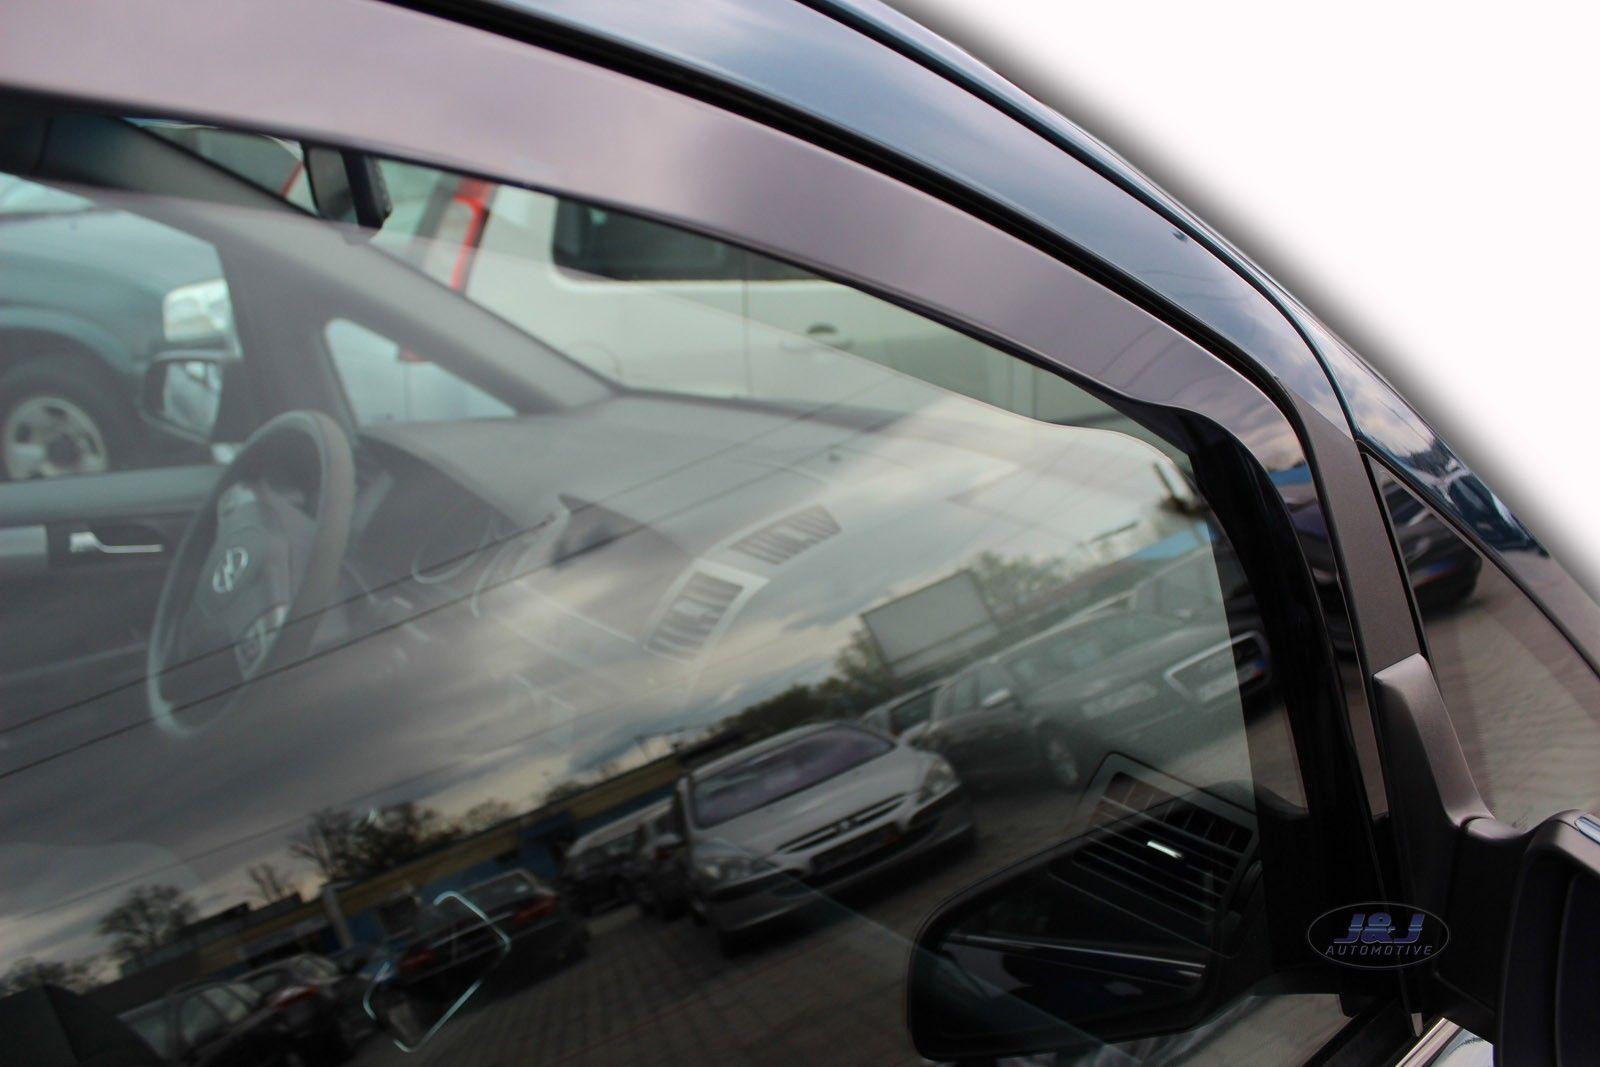 Heko 25323 HEKO-25323 Vauxhall Zafira B 2005-2011 Coupe-Vent Degli 4 pi/èce Set